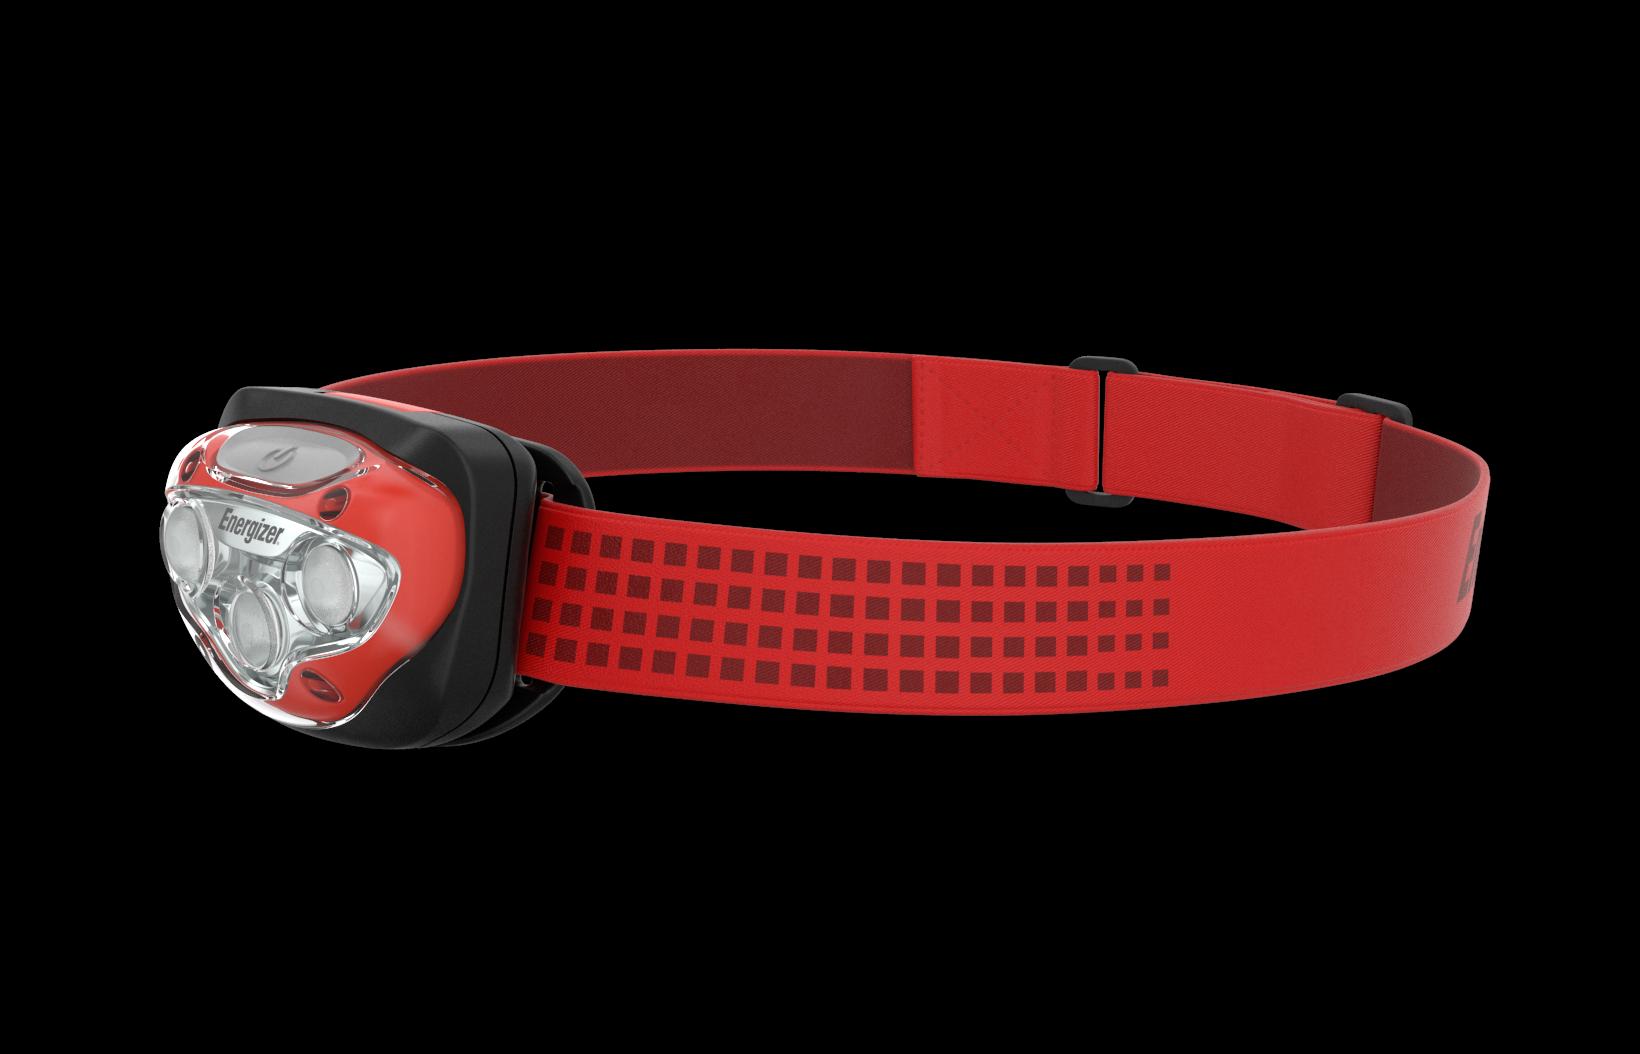 Red Energizer Vision HD Headlamp